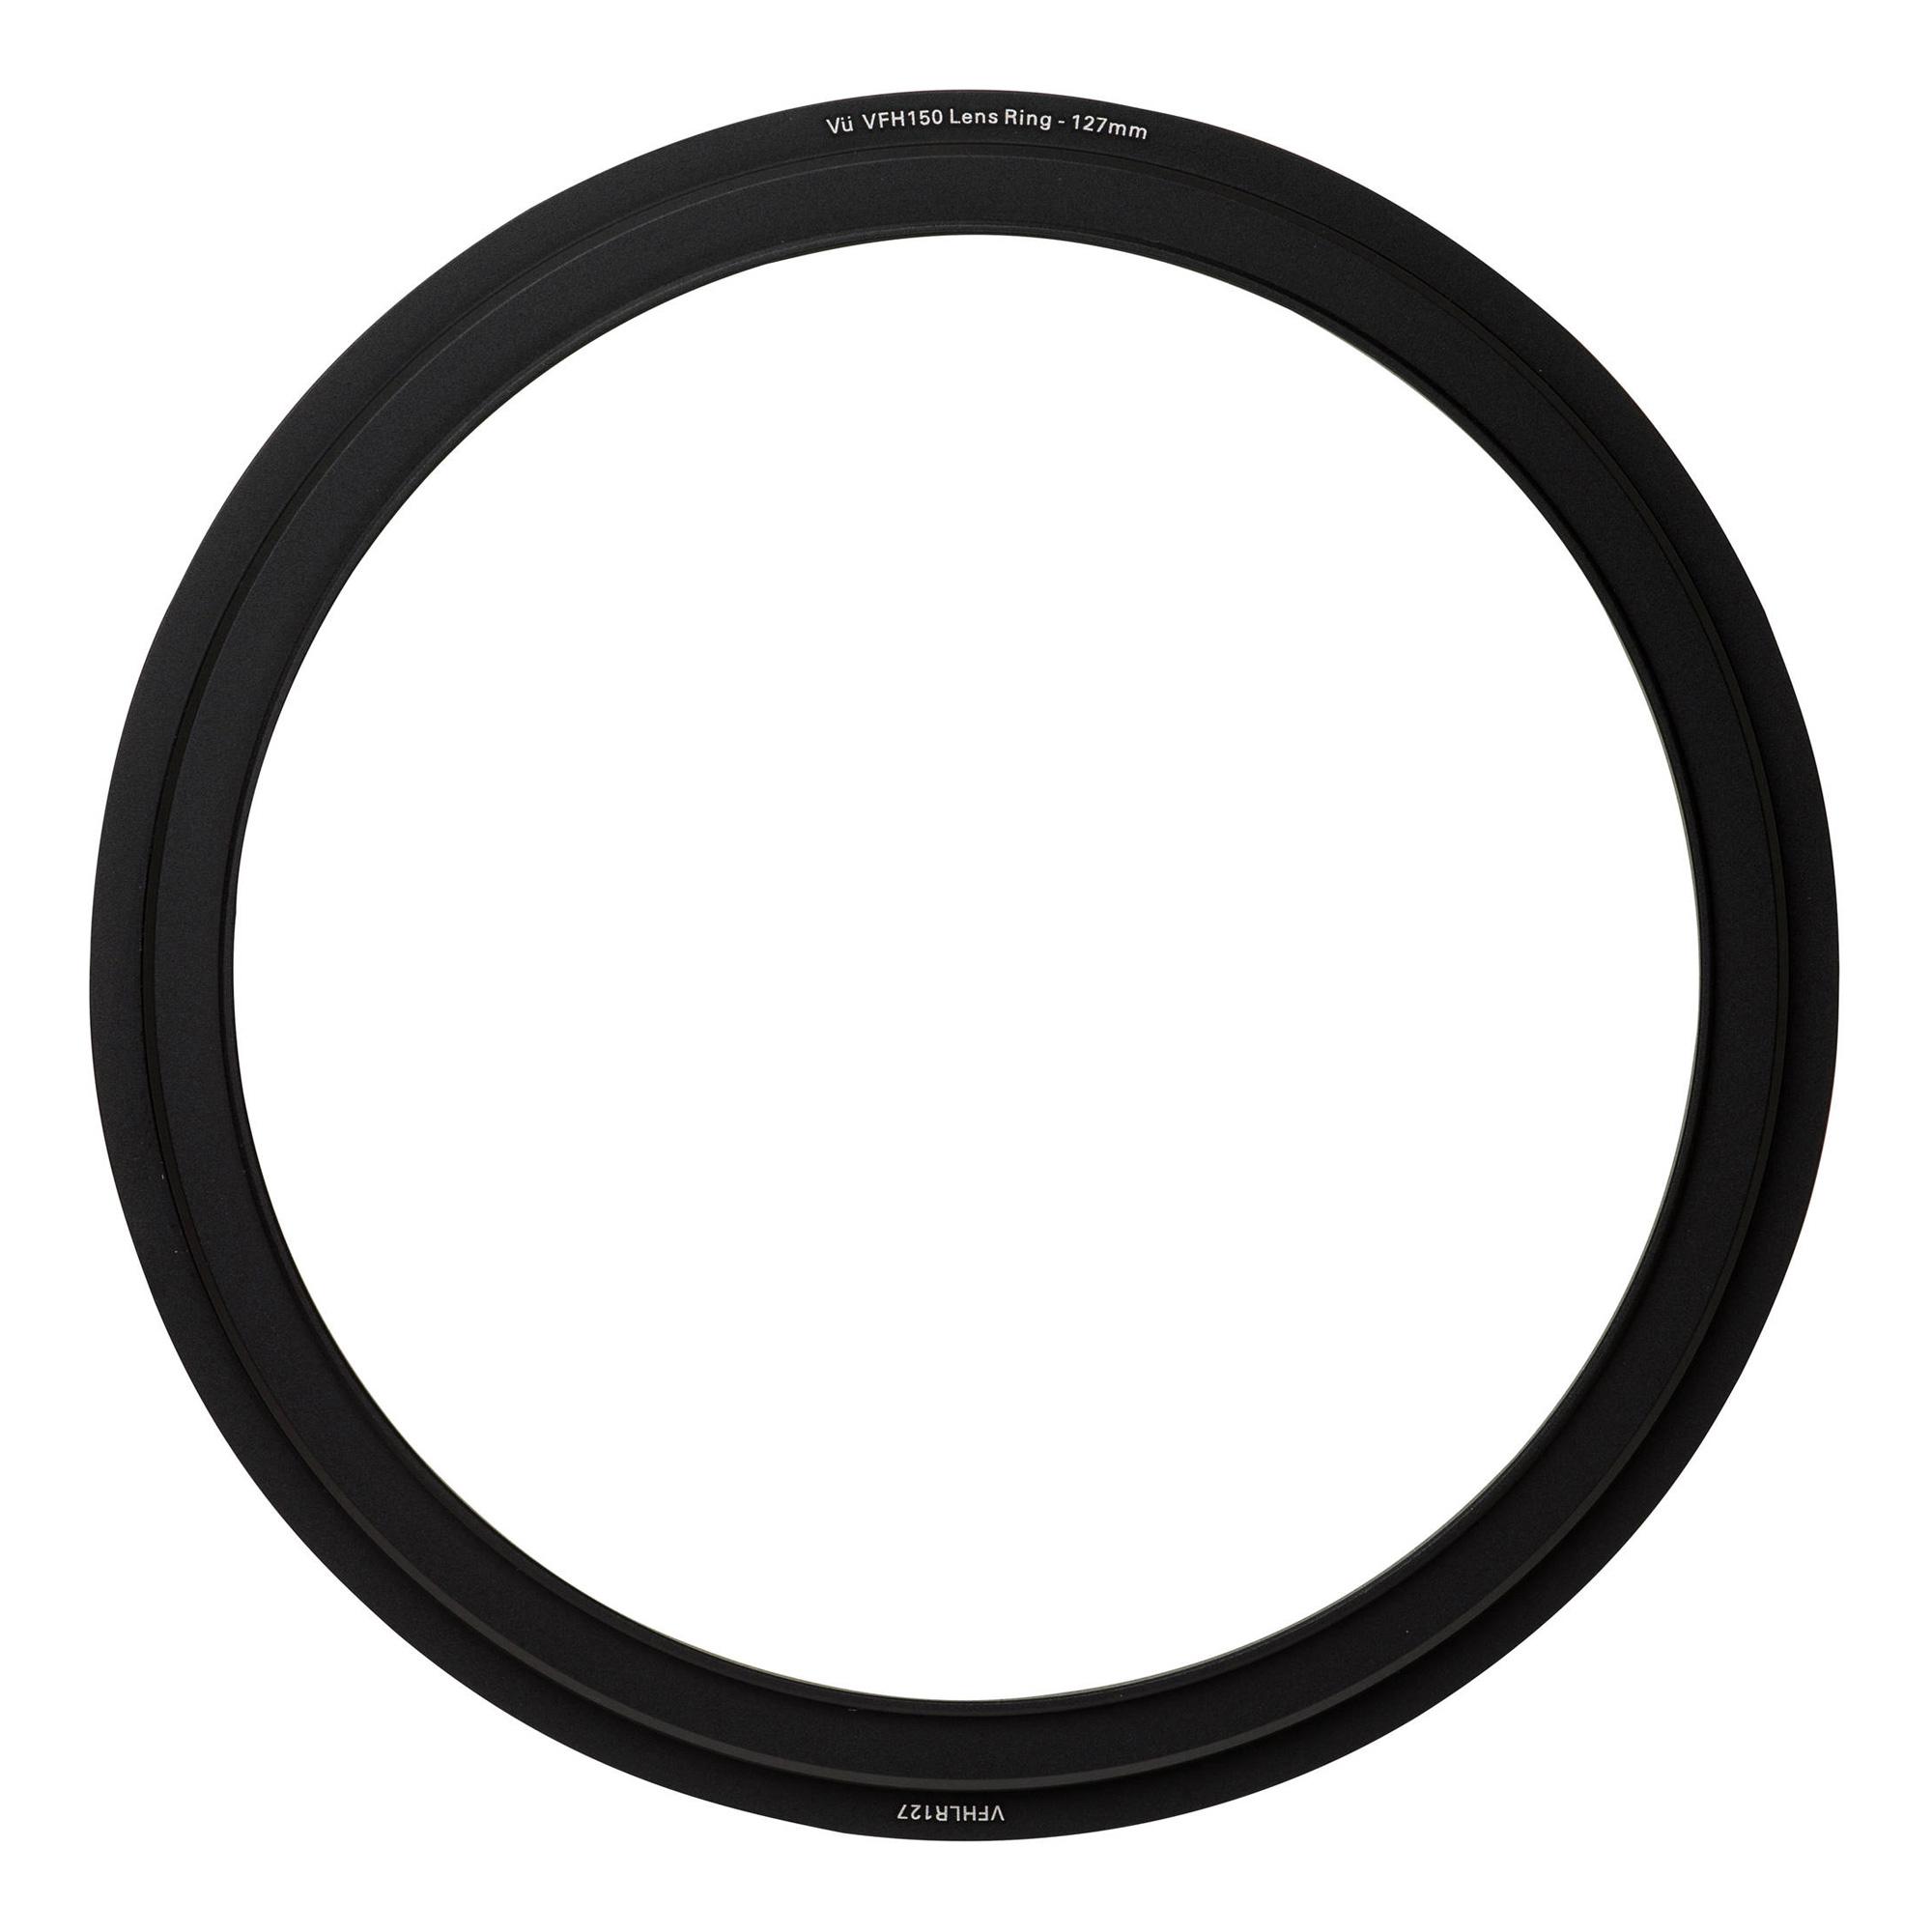 150mm Professional Filter Holder 127mm Lens Ring